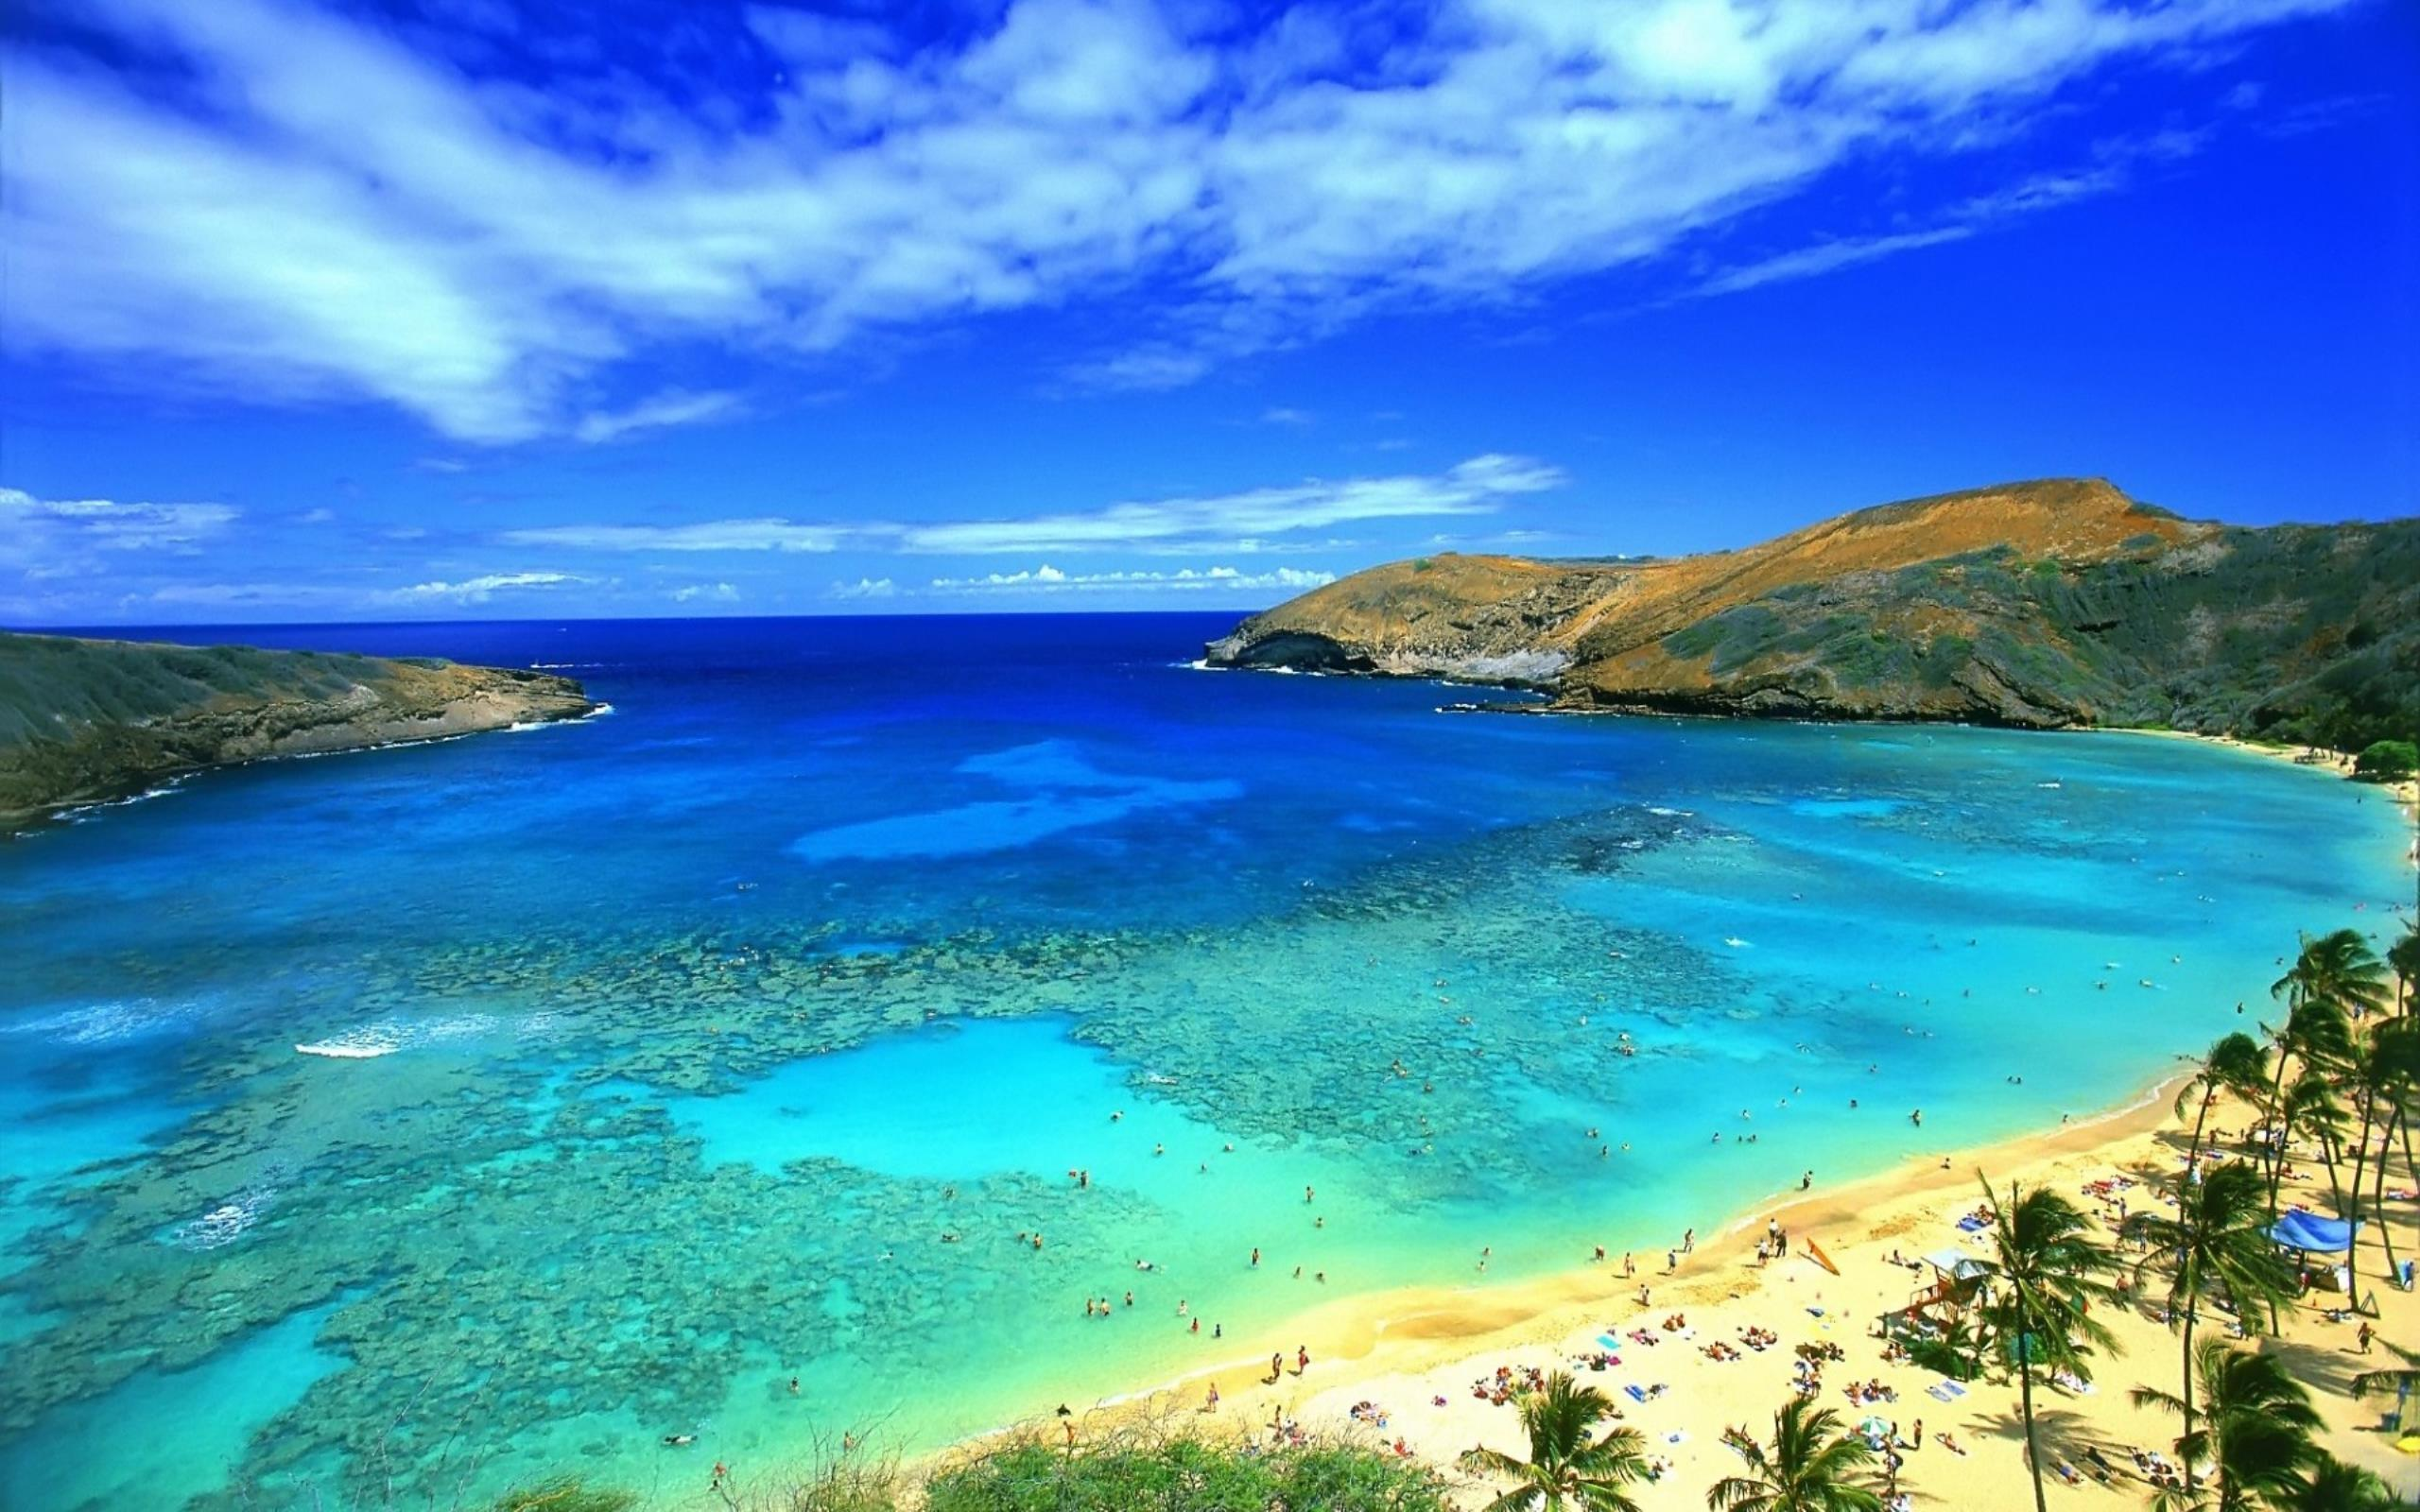 Hawaii Vacations Travel Guide amp Information  Hawaiicom